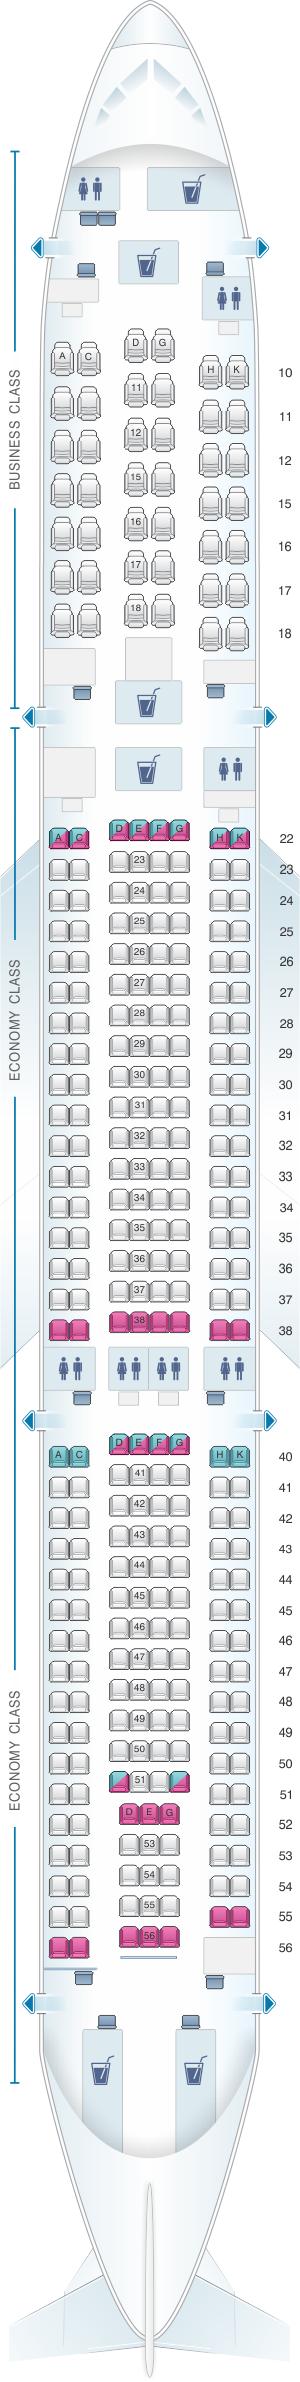 cathay pacific 333 seat map Thai Airways Airbus A330 Seat Map لم يسبق له مثيل الصور Tier3 Xyz cathay pacific 333 seat map